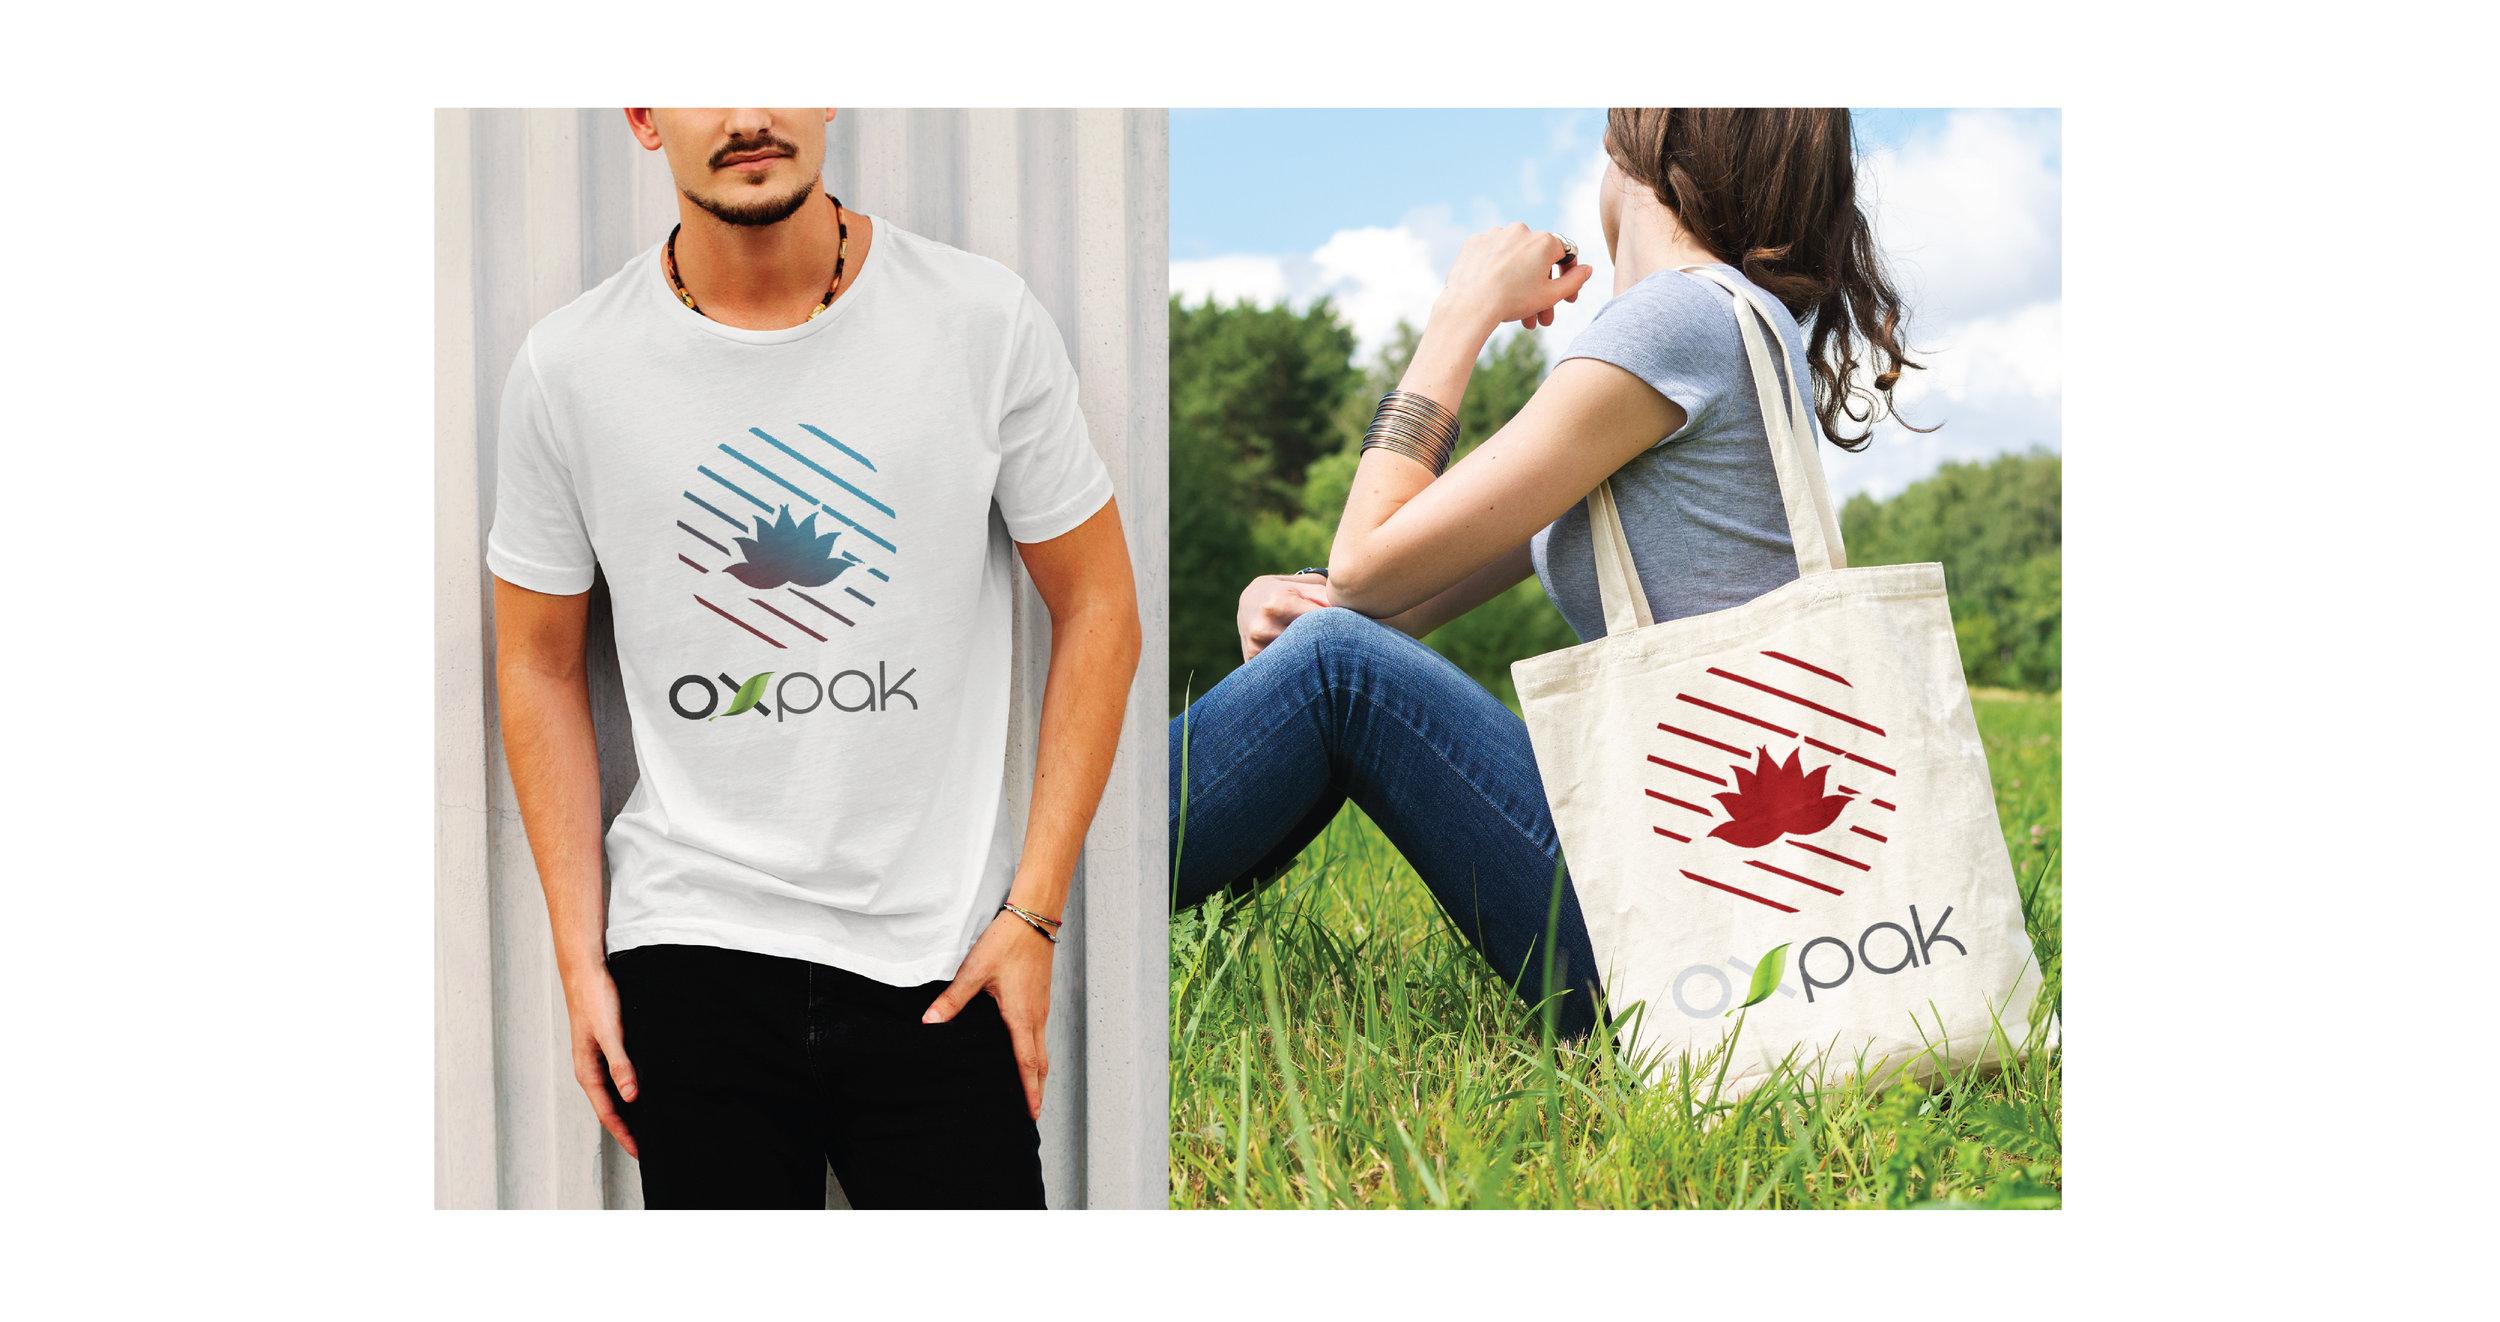 oxpak-design-promotionalmaterial.jpg